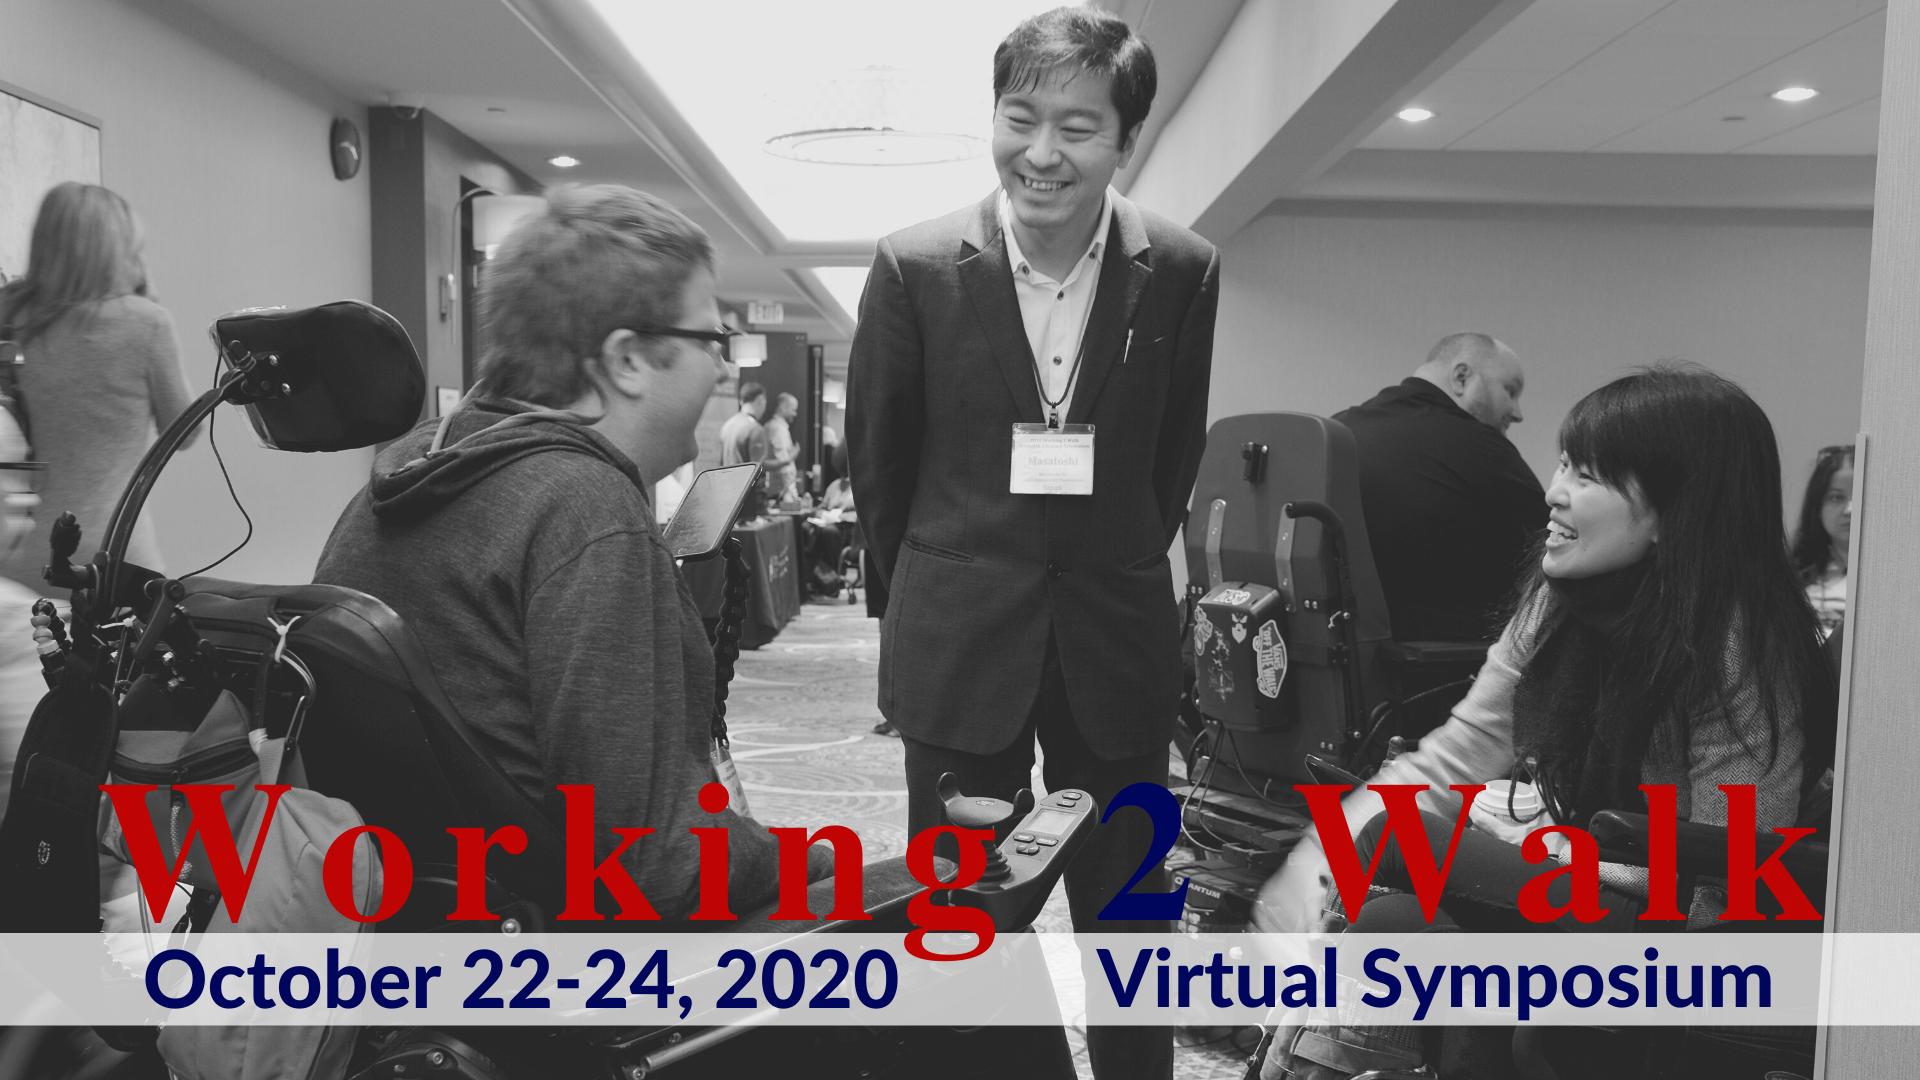 Stakeholder Highlight: Funders - Working 2 Walk 2020